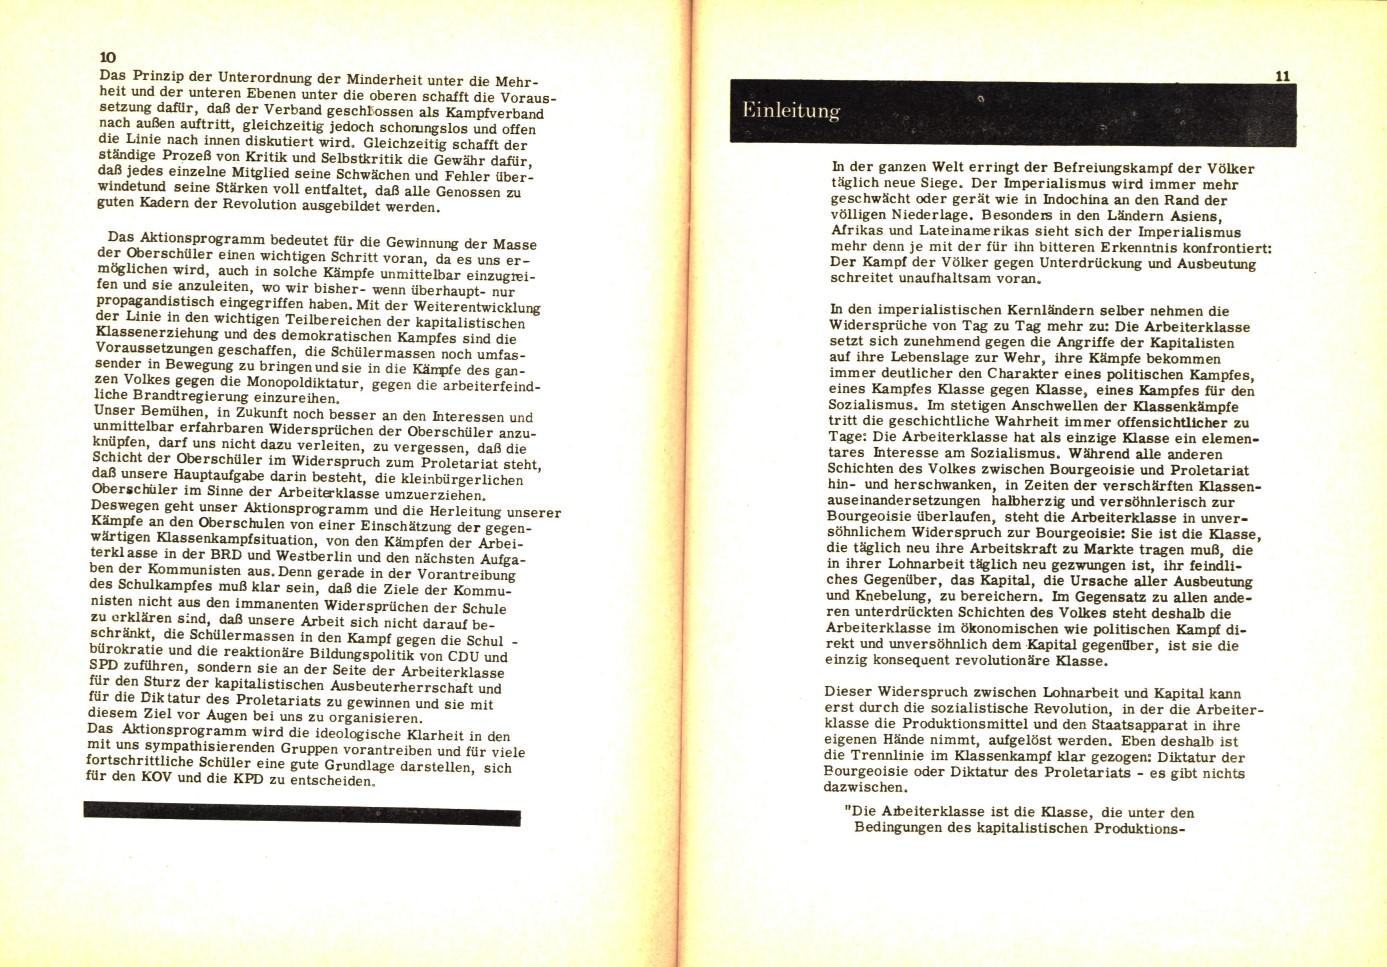 KOV_1973_Aktionsprogramm_08